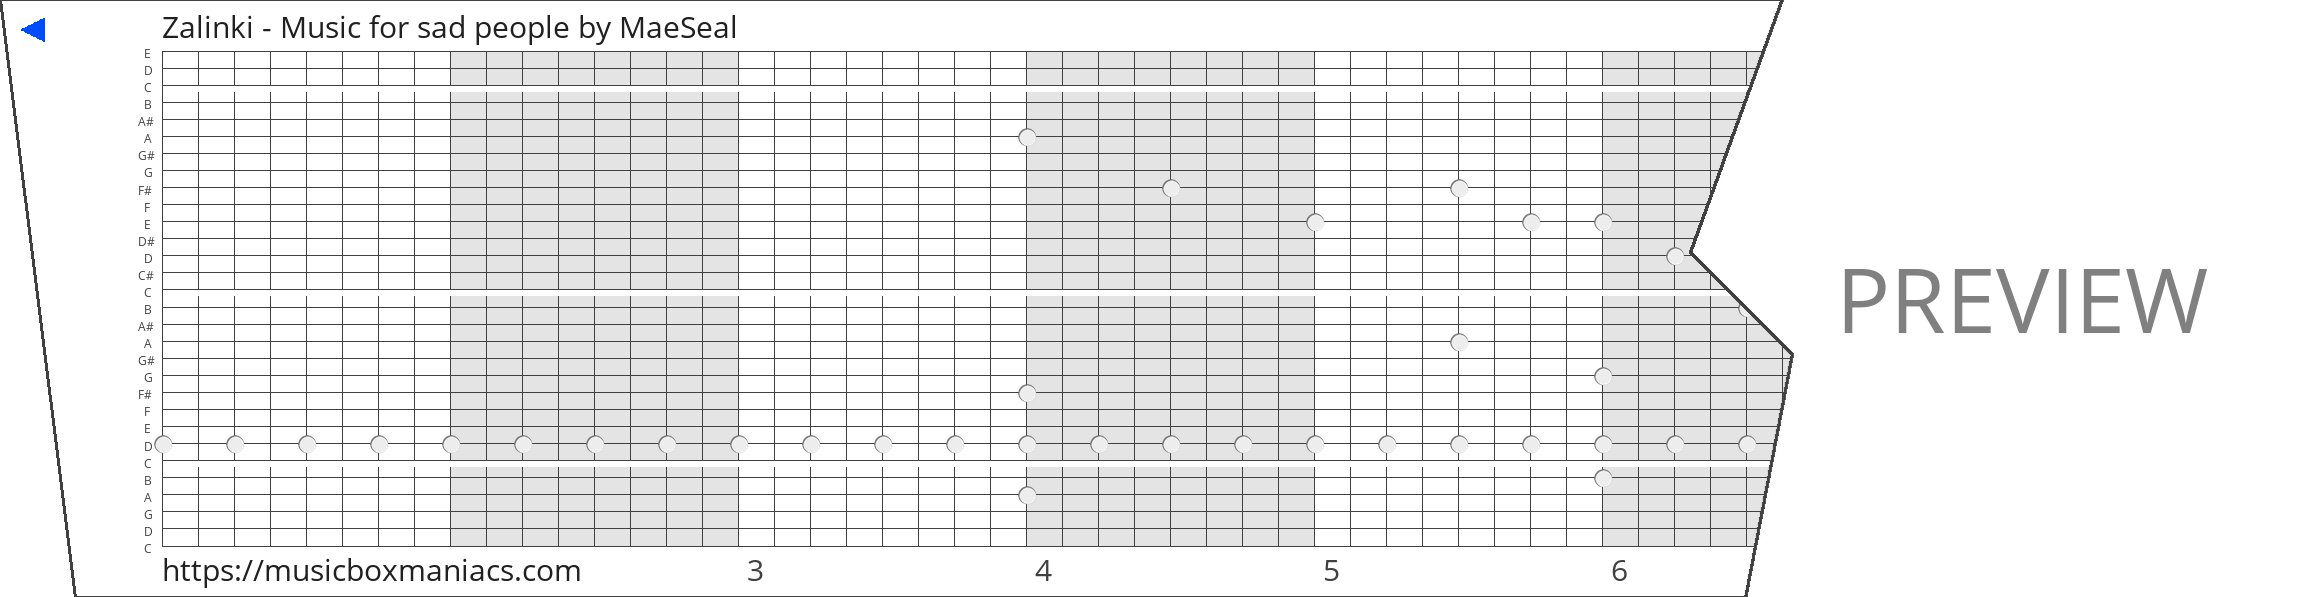 Zalinki - Music for sad people 30 note music box paper strip